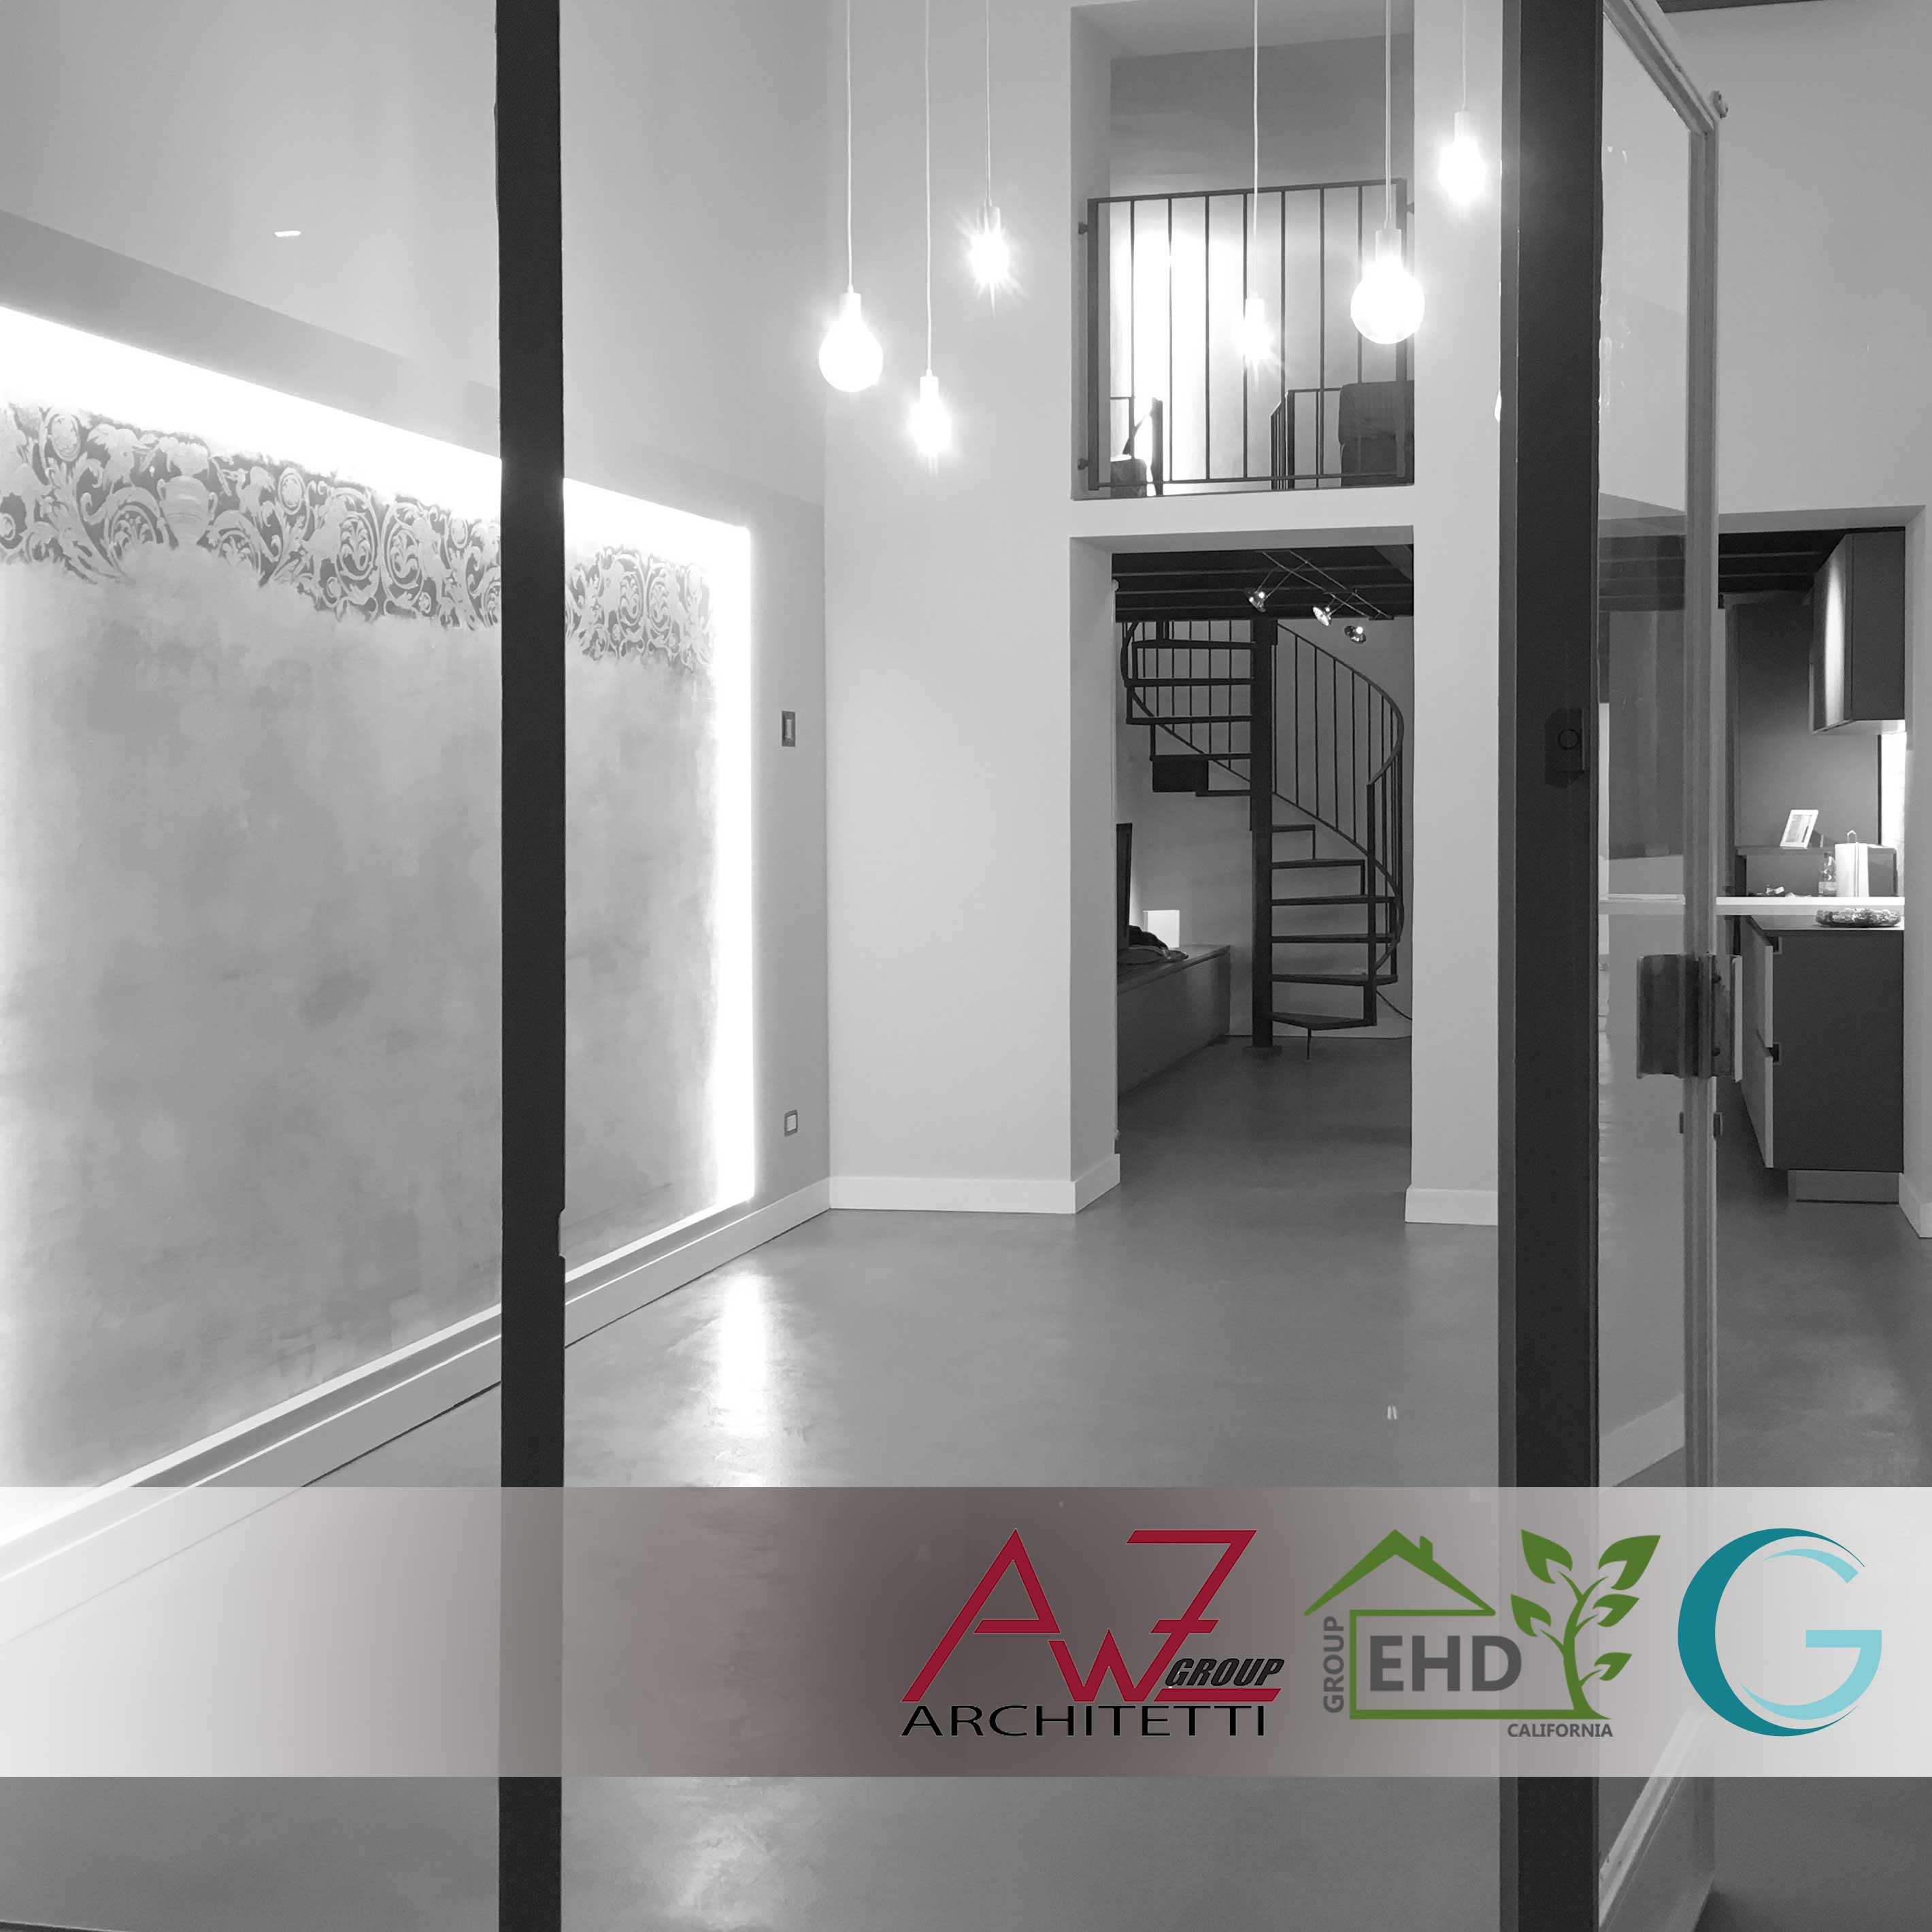 Logo AWZ group Architetti